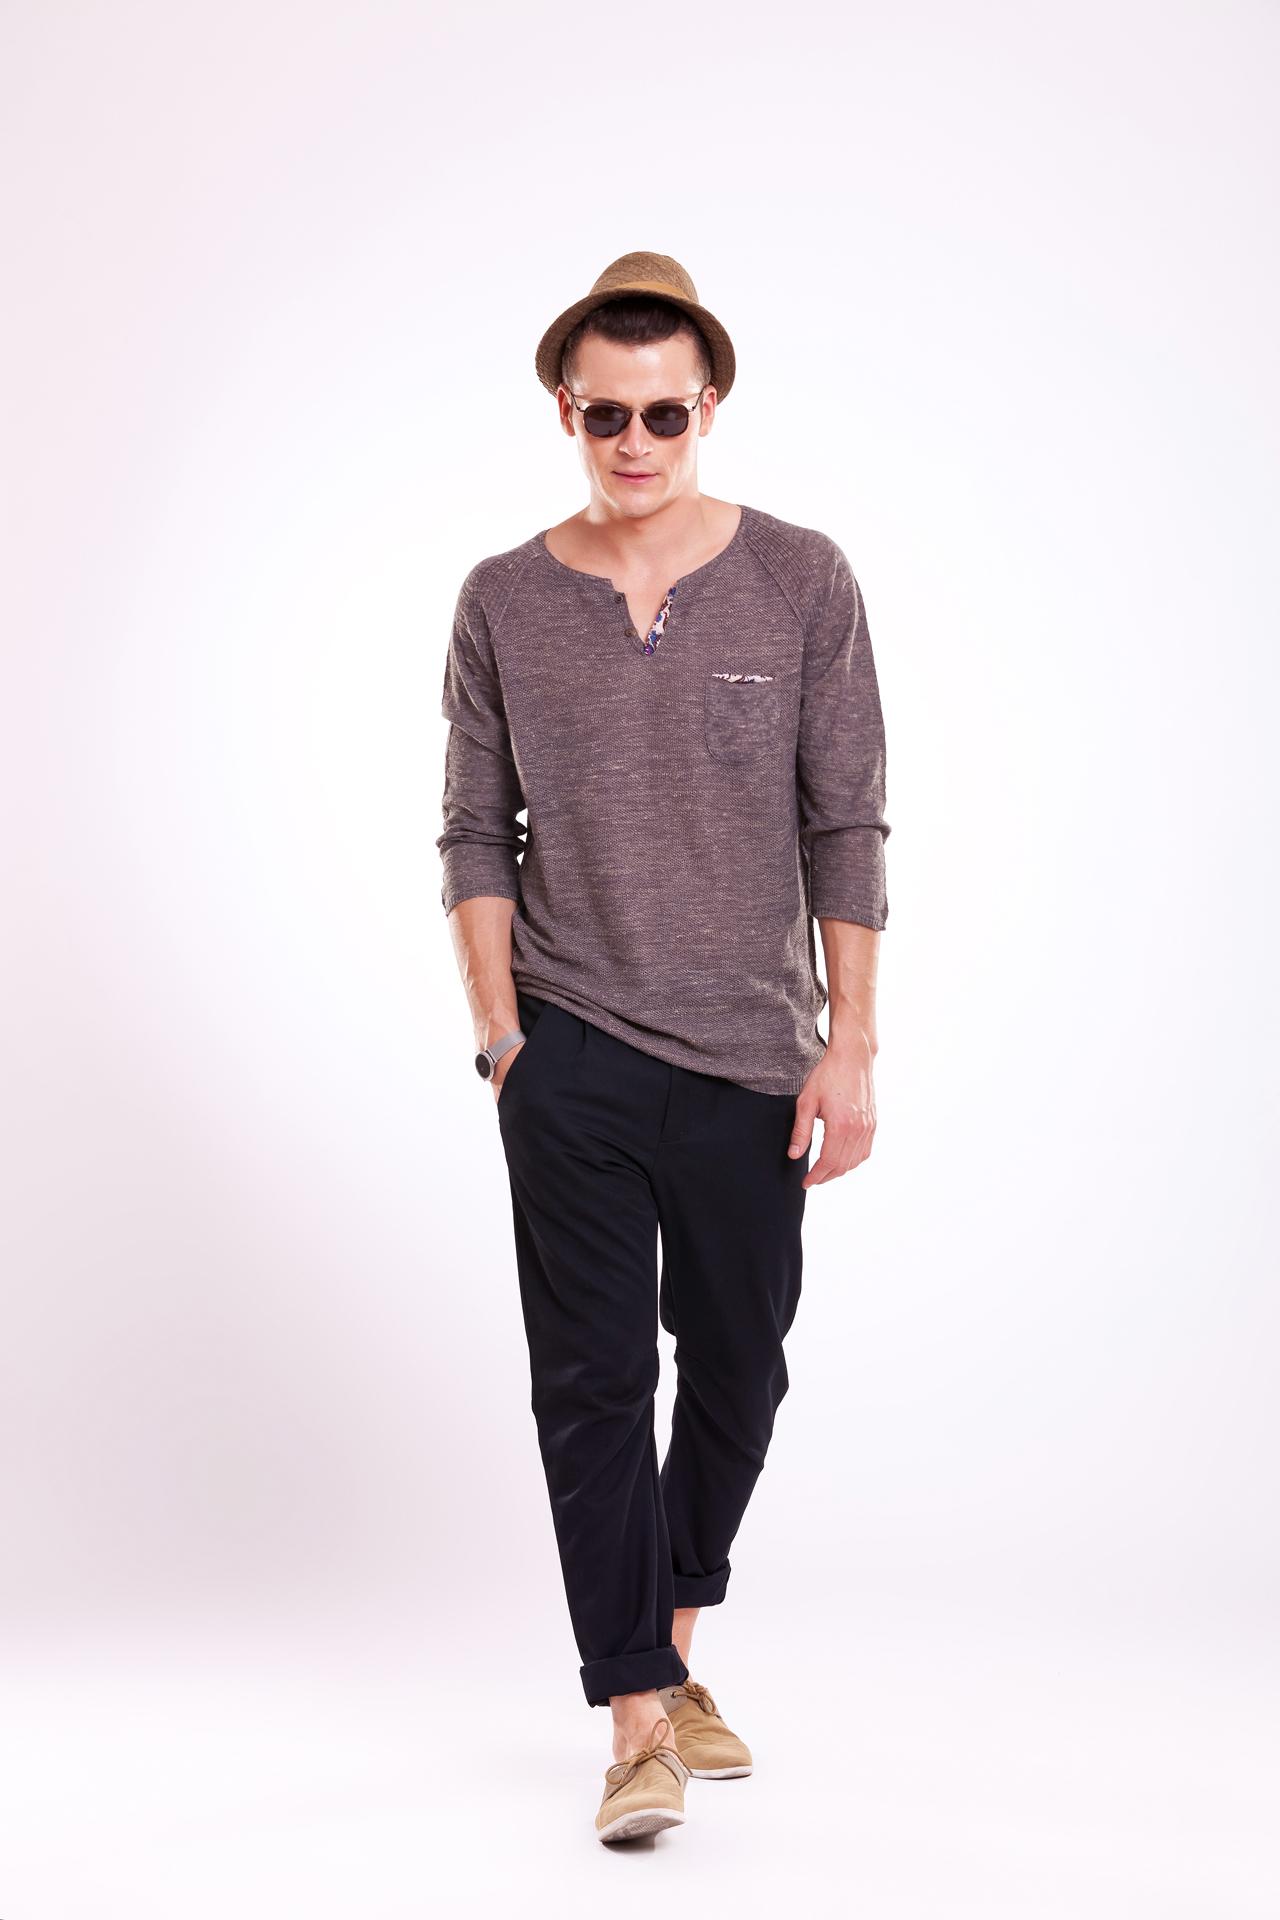 Cool Fashion Model